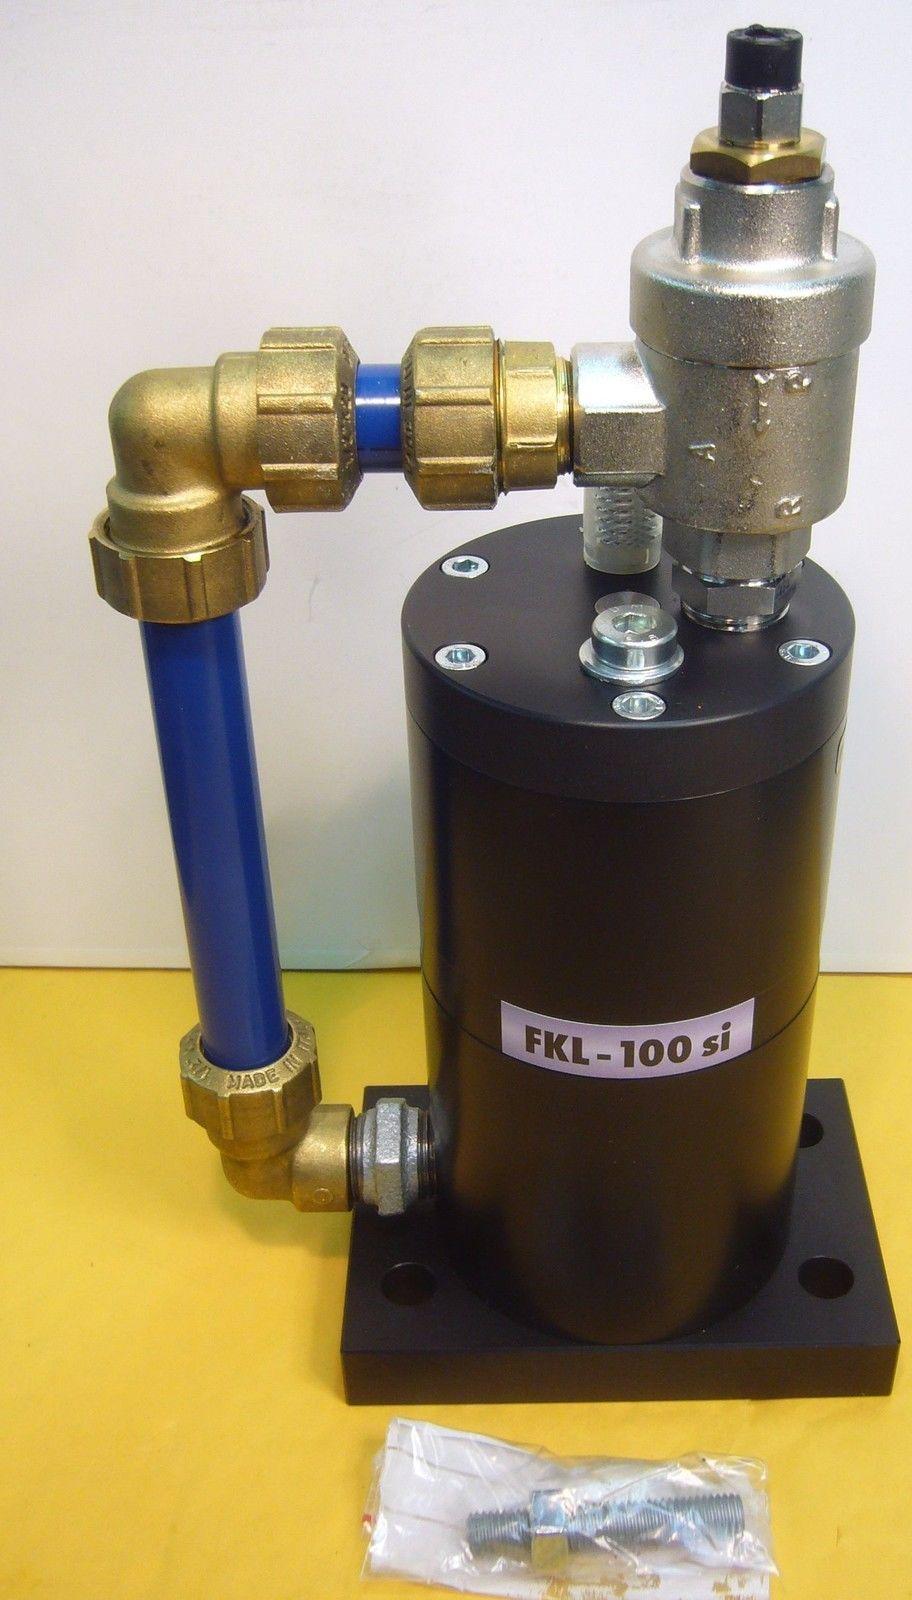 FKL-100si 空气锤参数与尺寸介绍点击进入